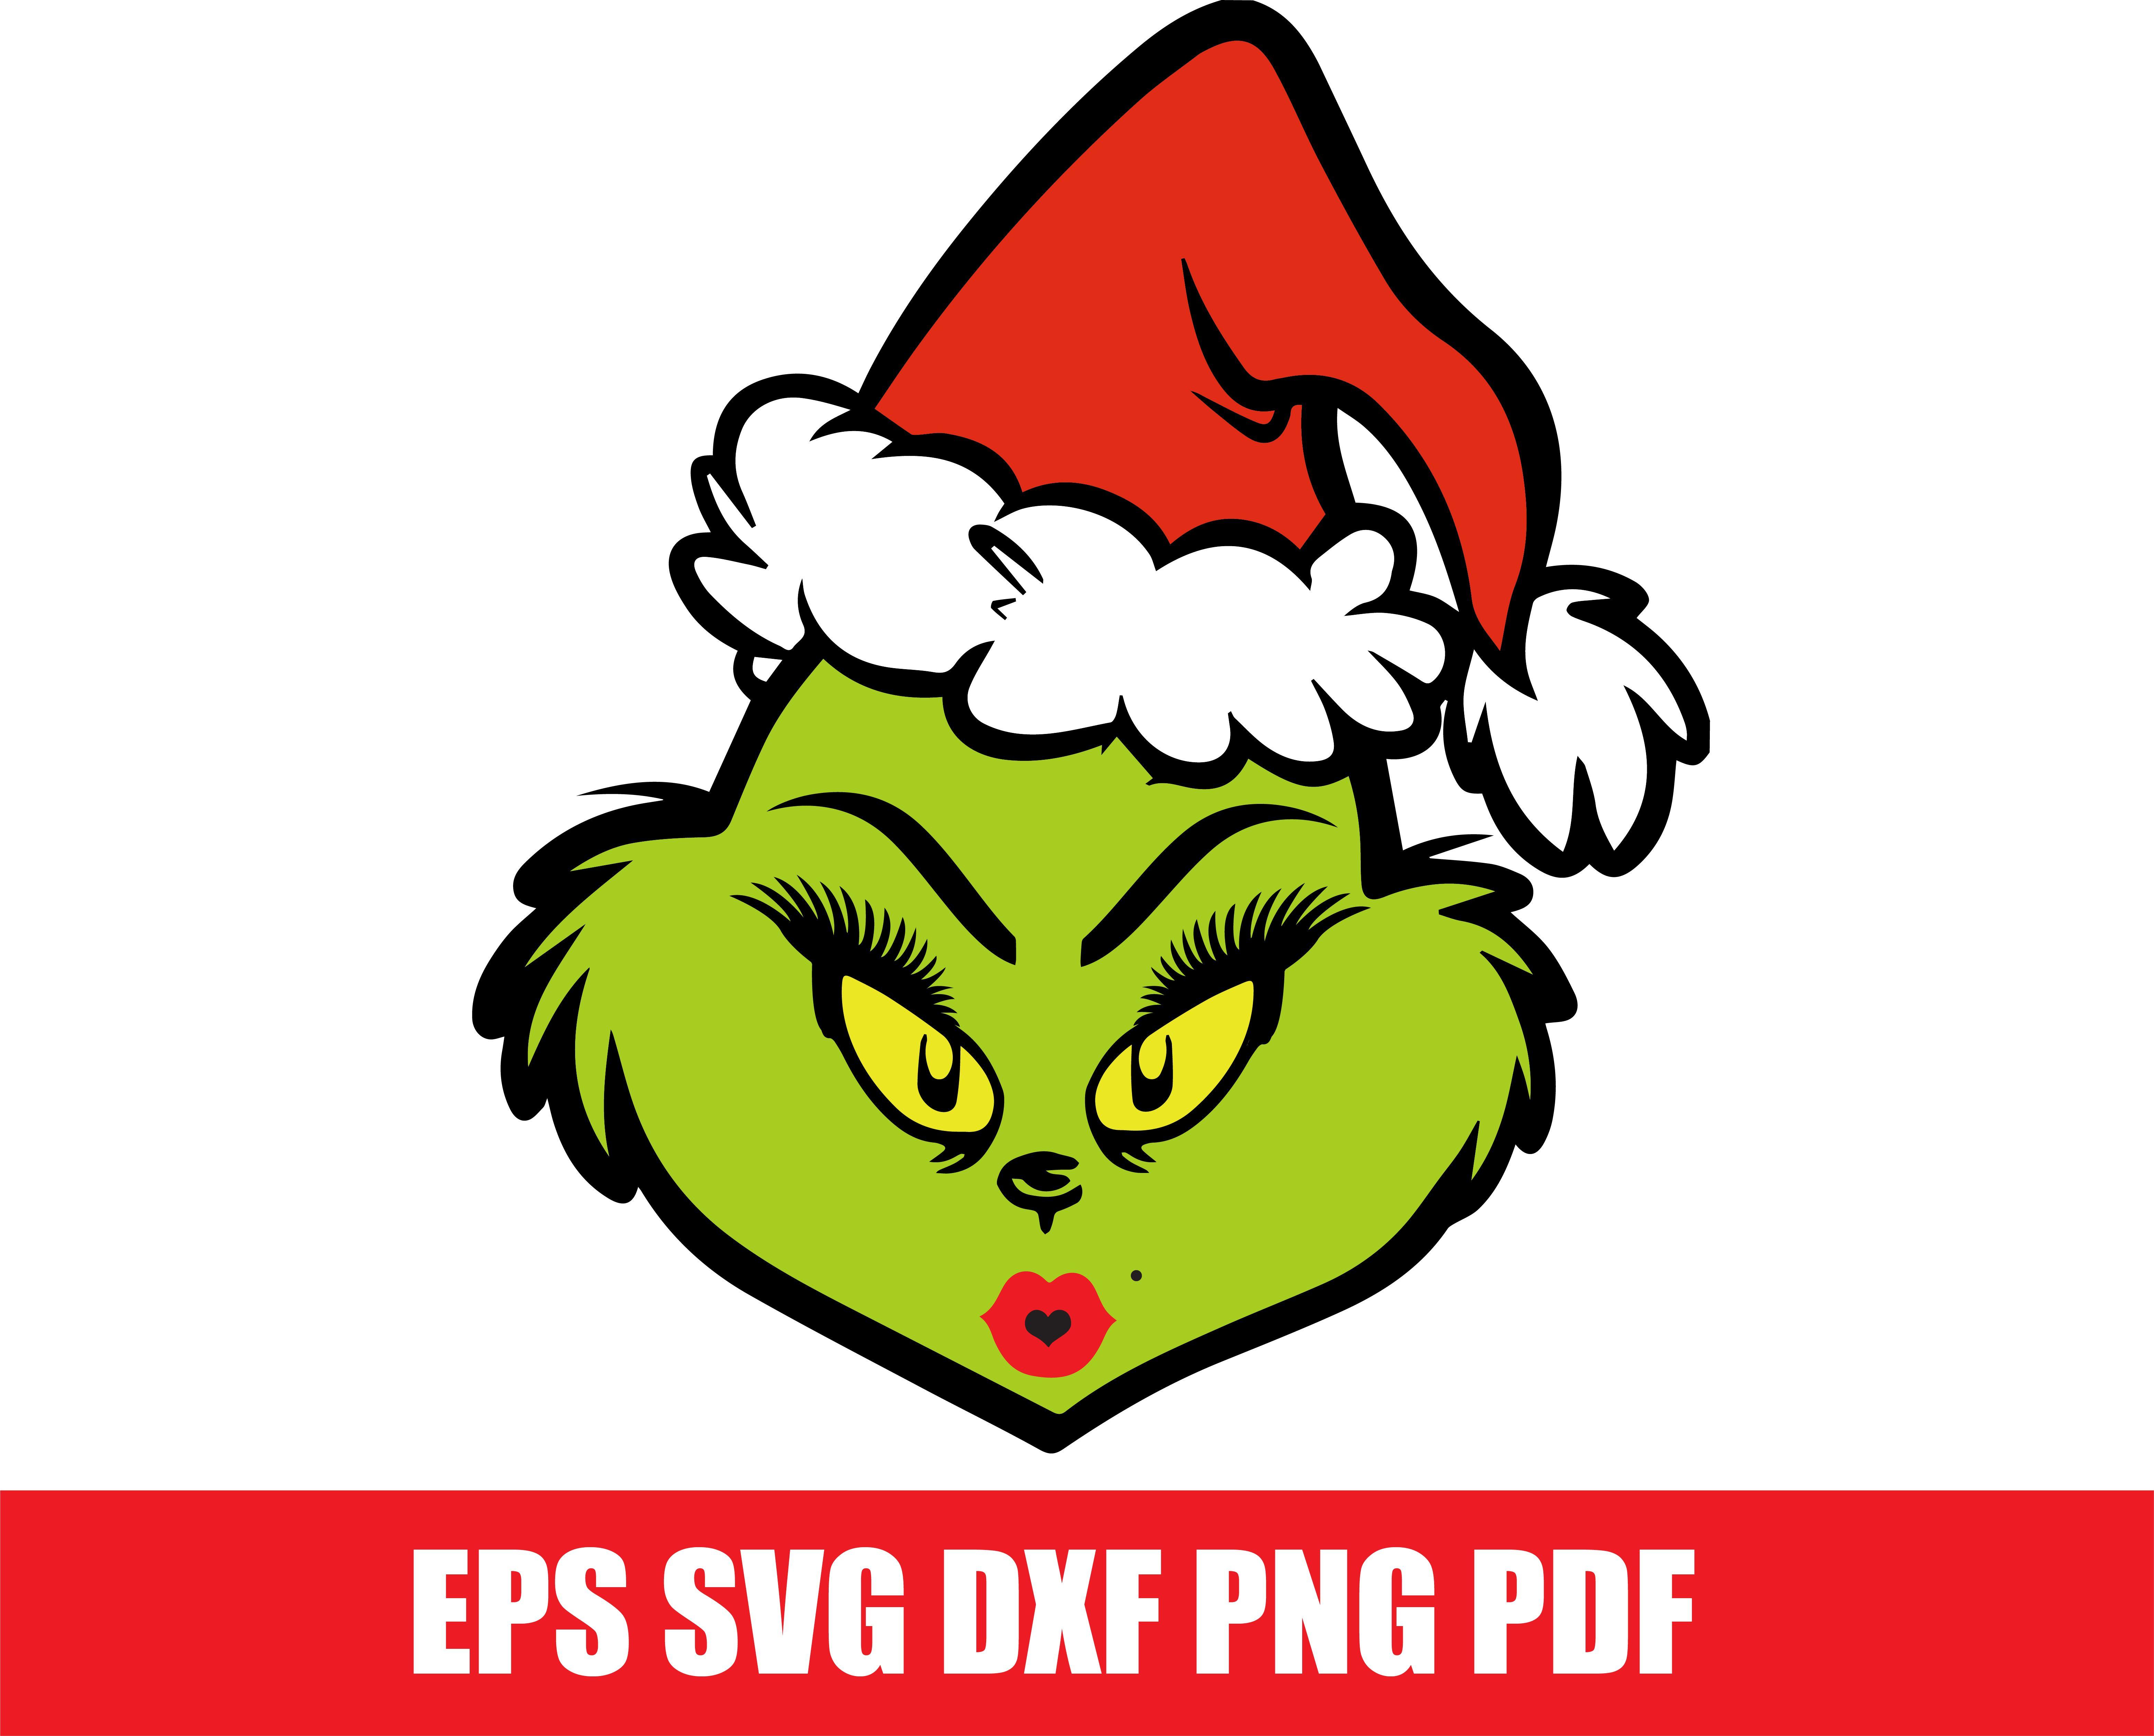 Grinch Svg Mrs Grinch Face Svg Christmas Svg Grinch Smile Svg Grinch Png Cricut Designs Silhouette Svg Sublimation Designs Downloads Grinch Face Svg Scrapbook Designs Grinch